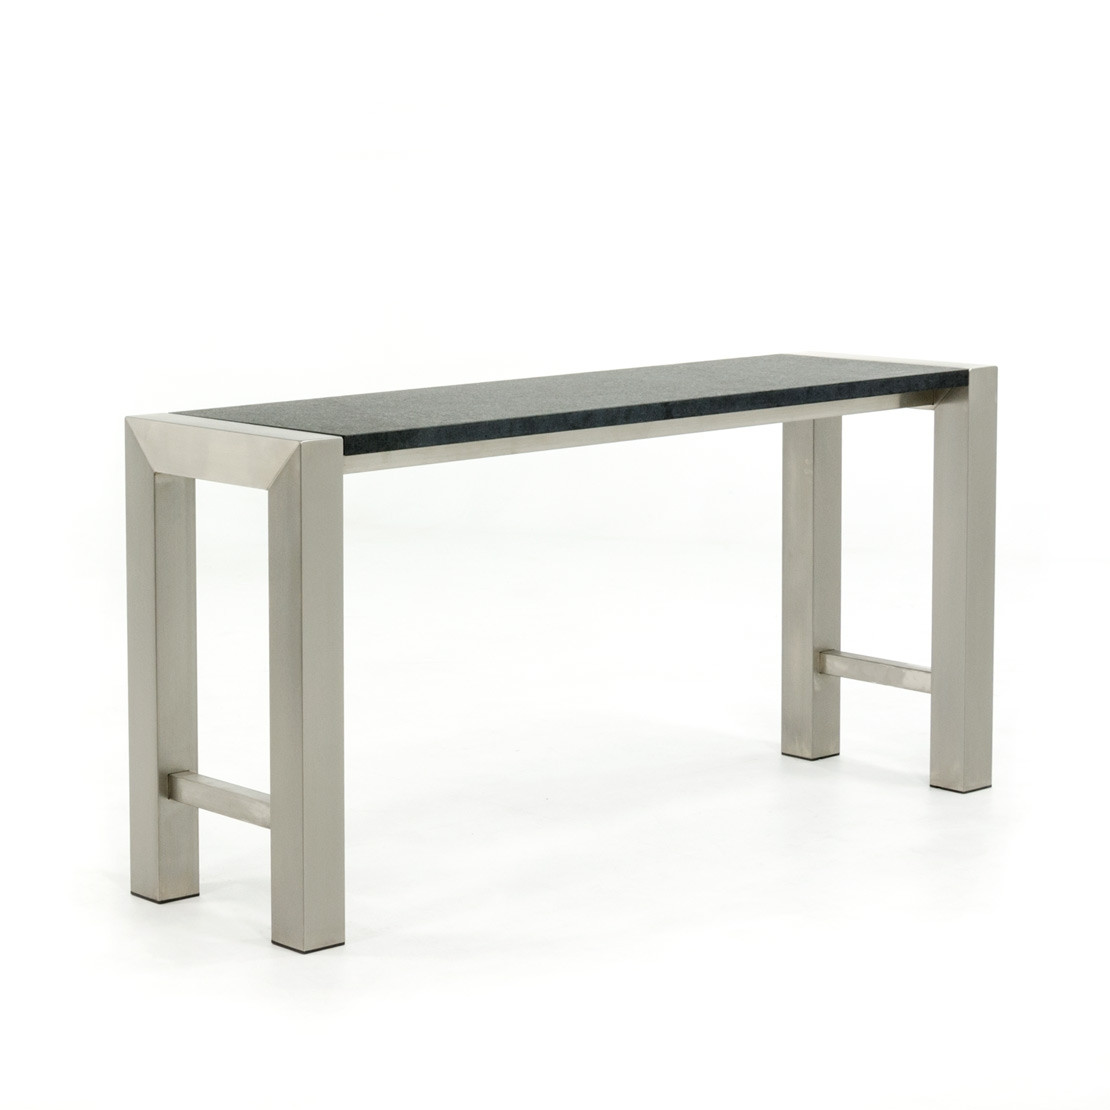 RVS side-table met basalt (gevlamd) bovenblad